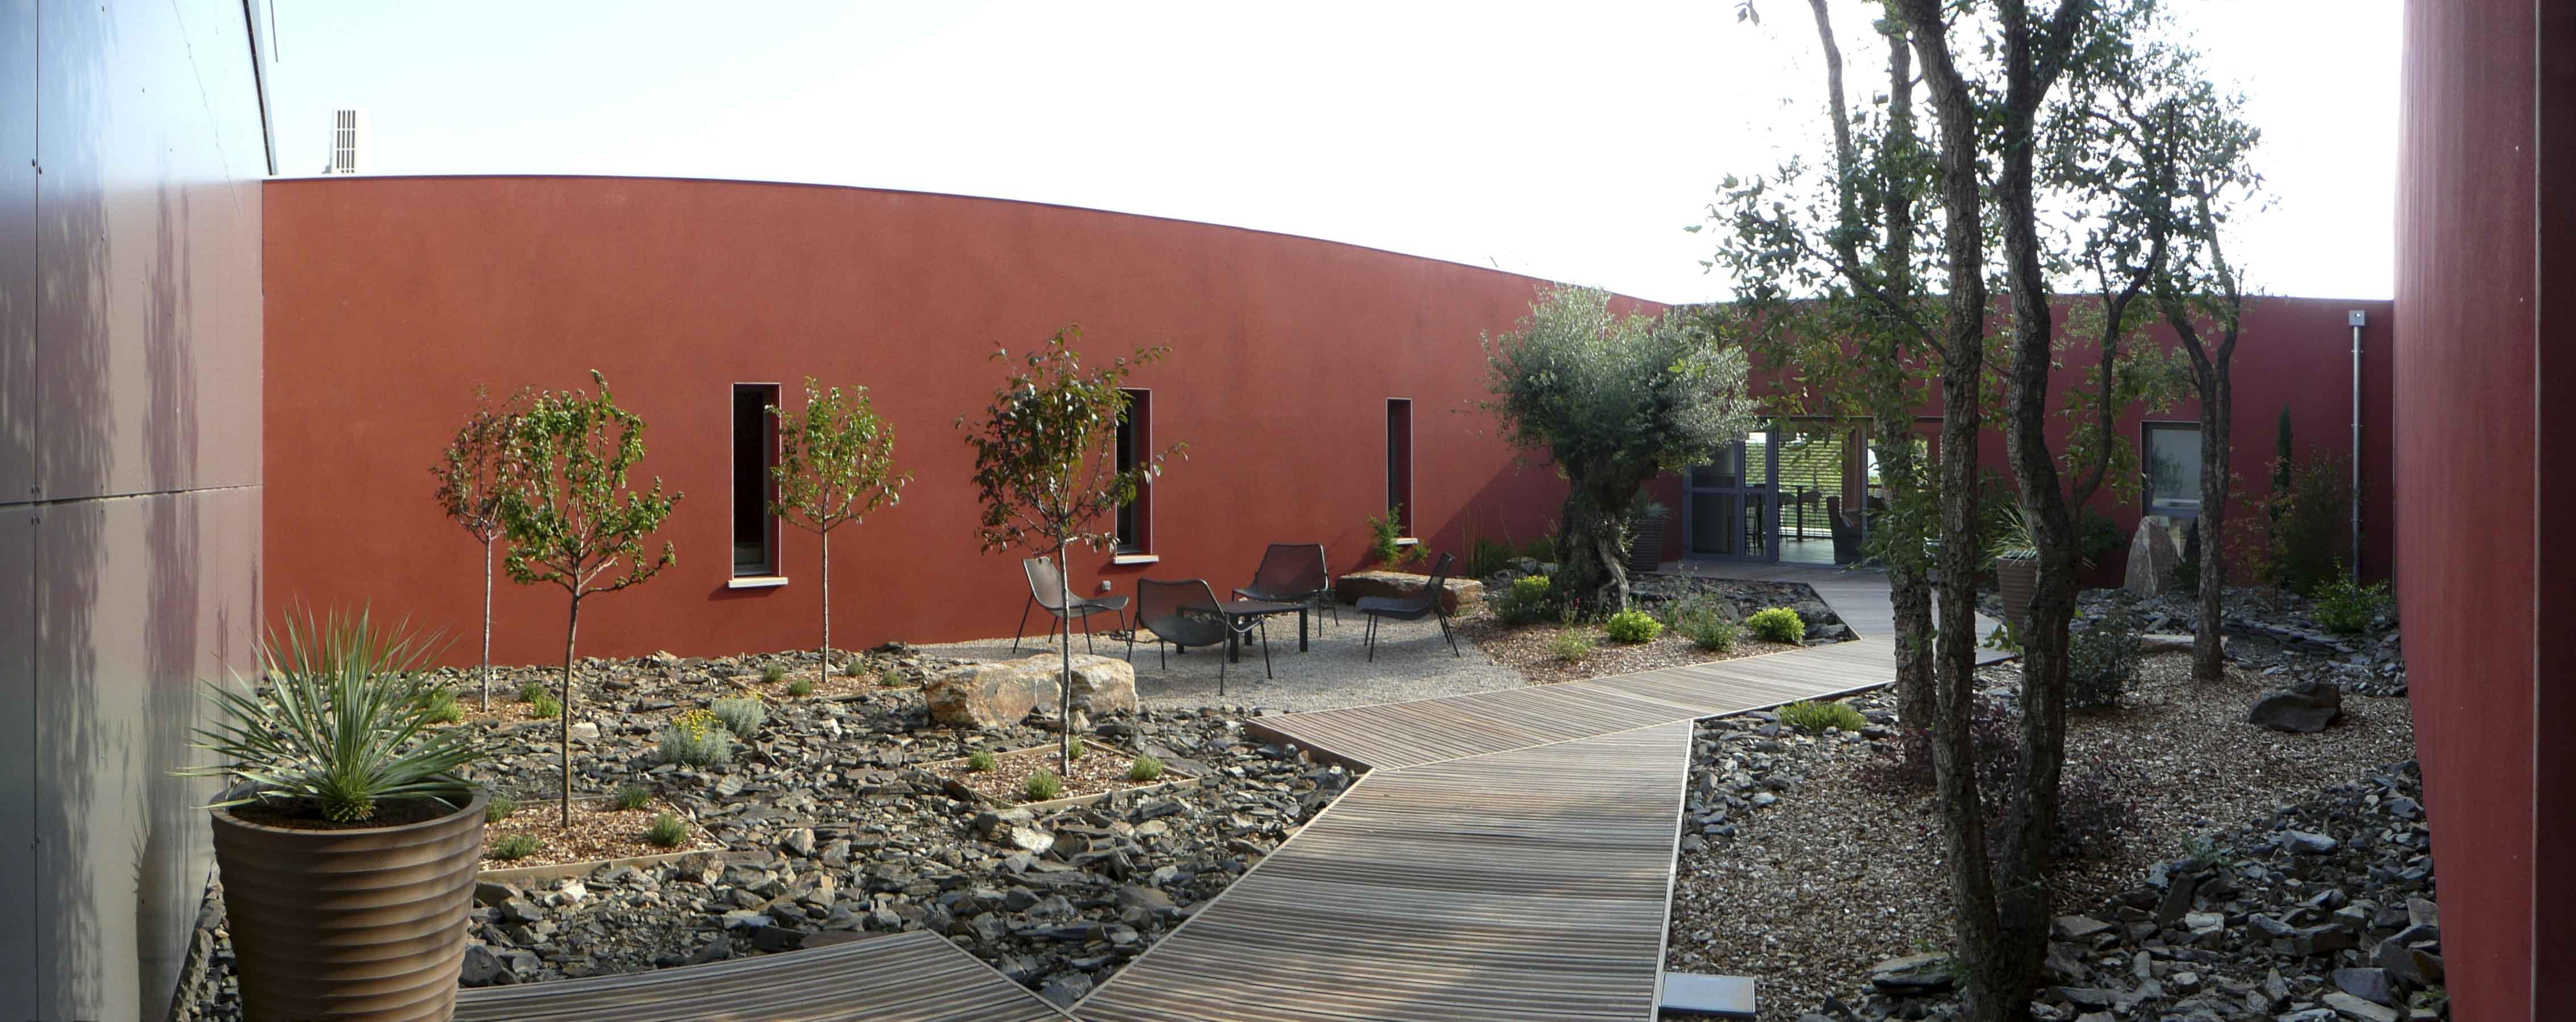 Mas Gabinele Hérault BF Architecture viticole 5